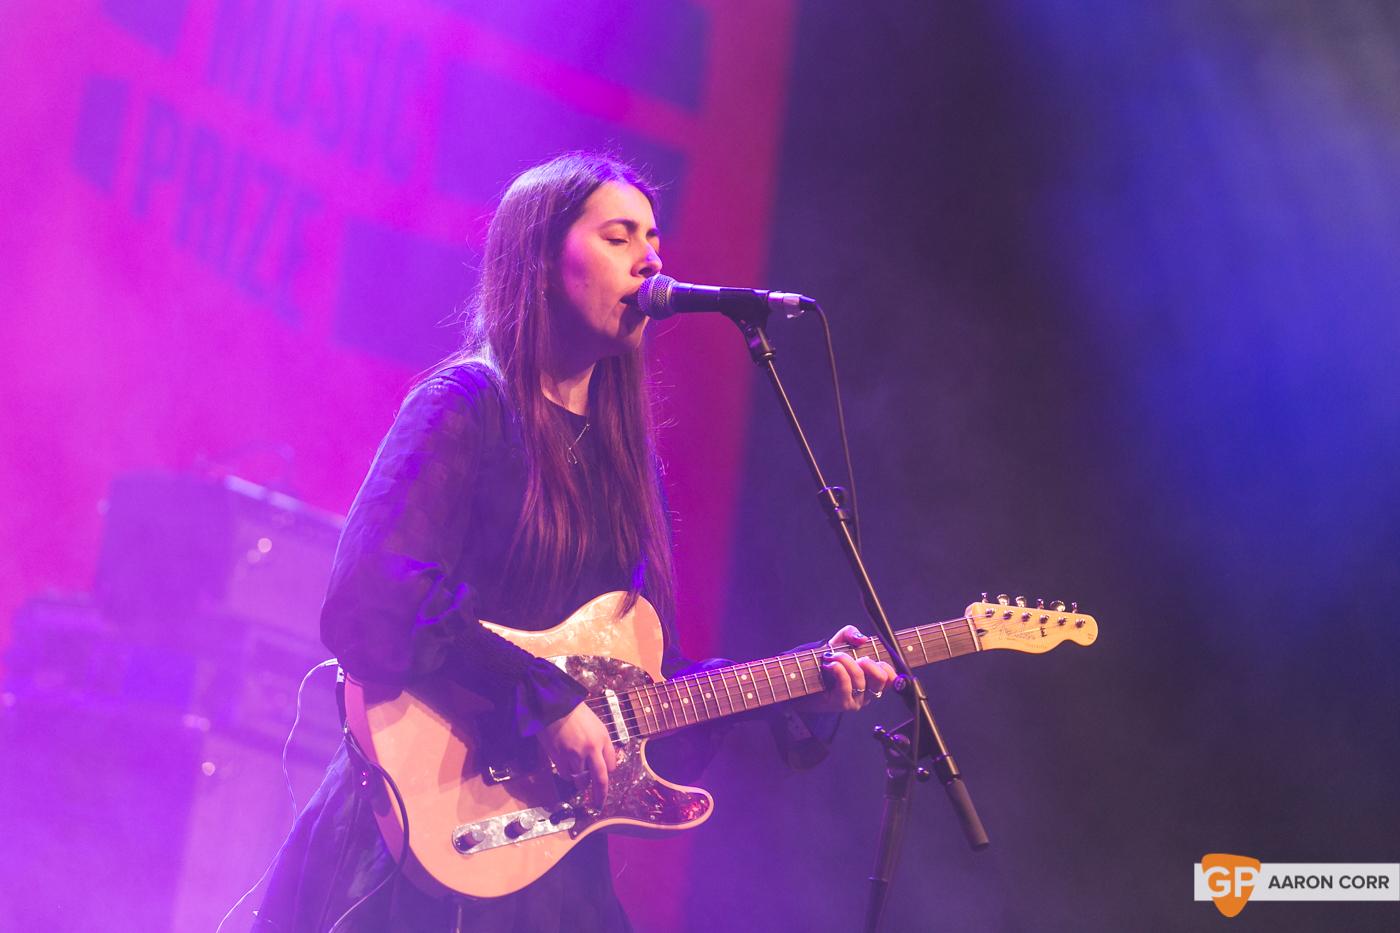 Sorcha Richardson at Choice Music Prize 2020 in Vicar Street, Dublin on 05-Mar-20 by Aaron Corr-5297